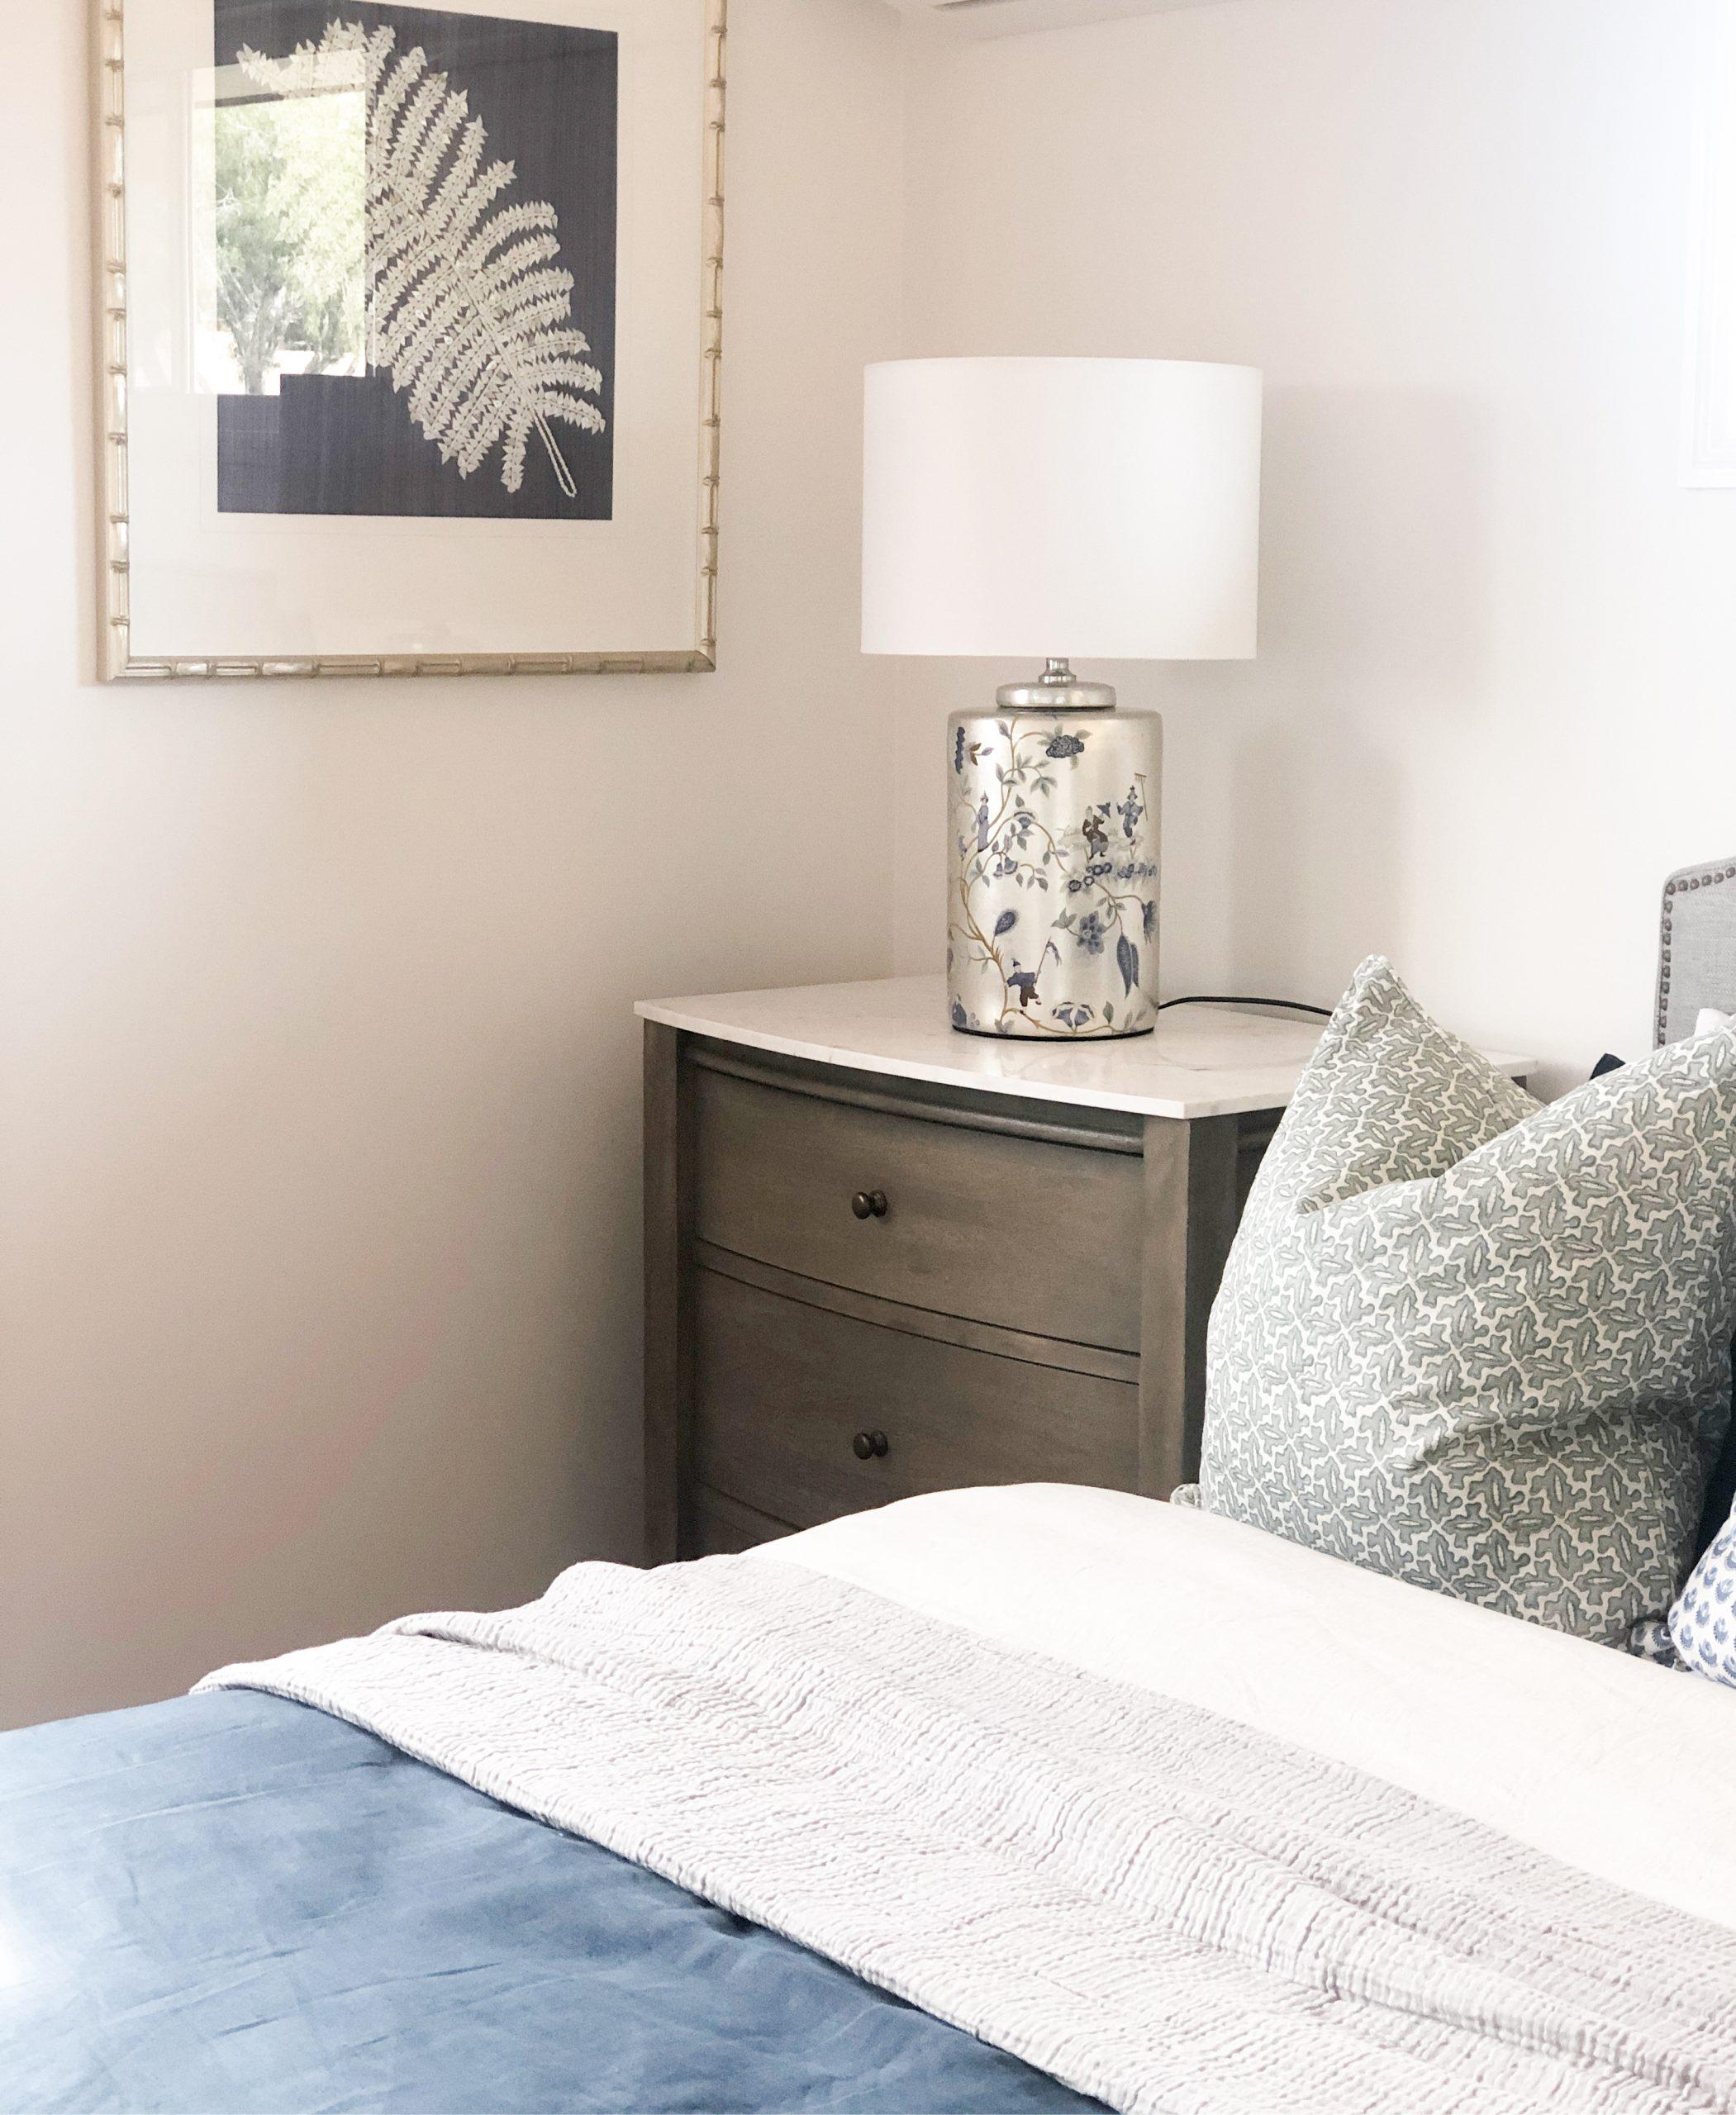 https://www.ivyandfinch.com.au/wp-content/uploads/2021/02/Bracken-Ridge-Interior-Design-Bedroom-Makeover-scaled.jpg